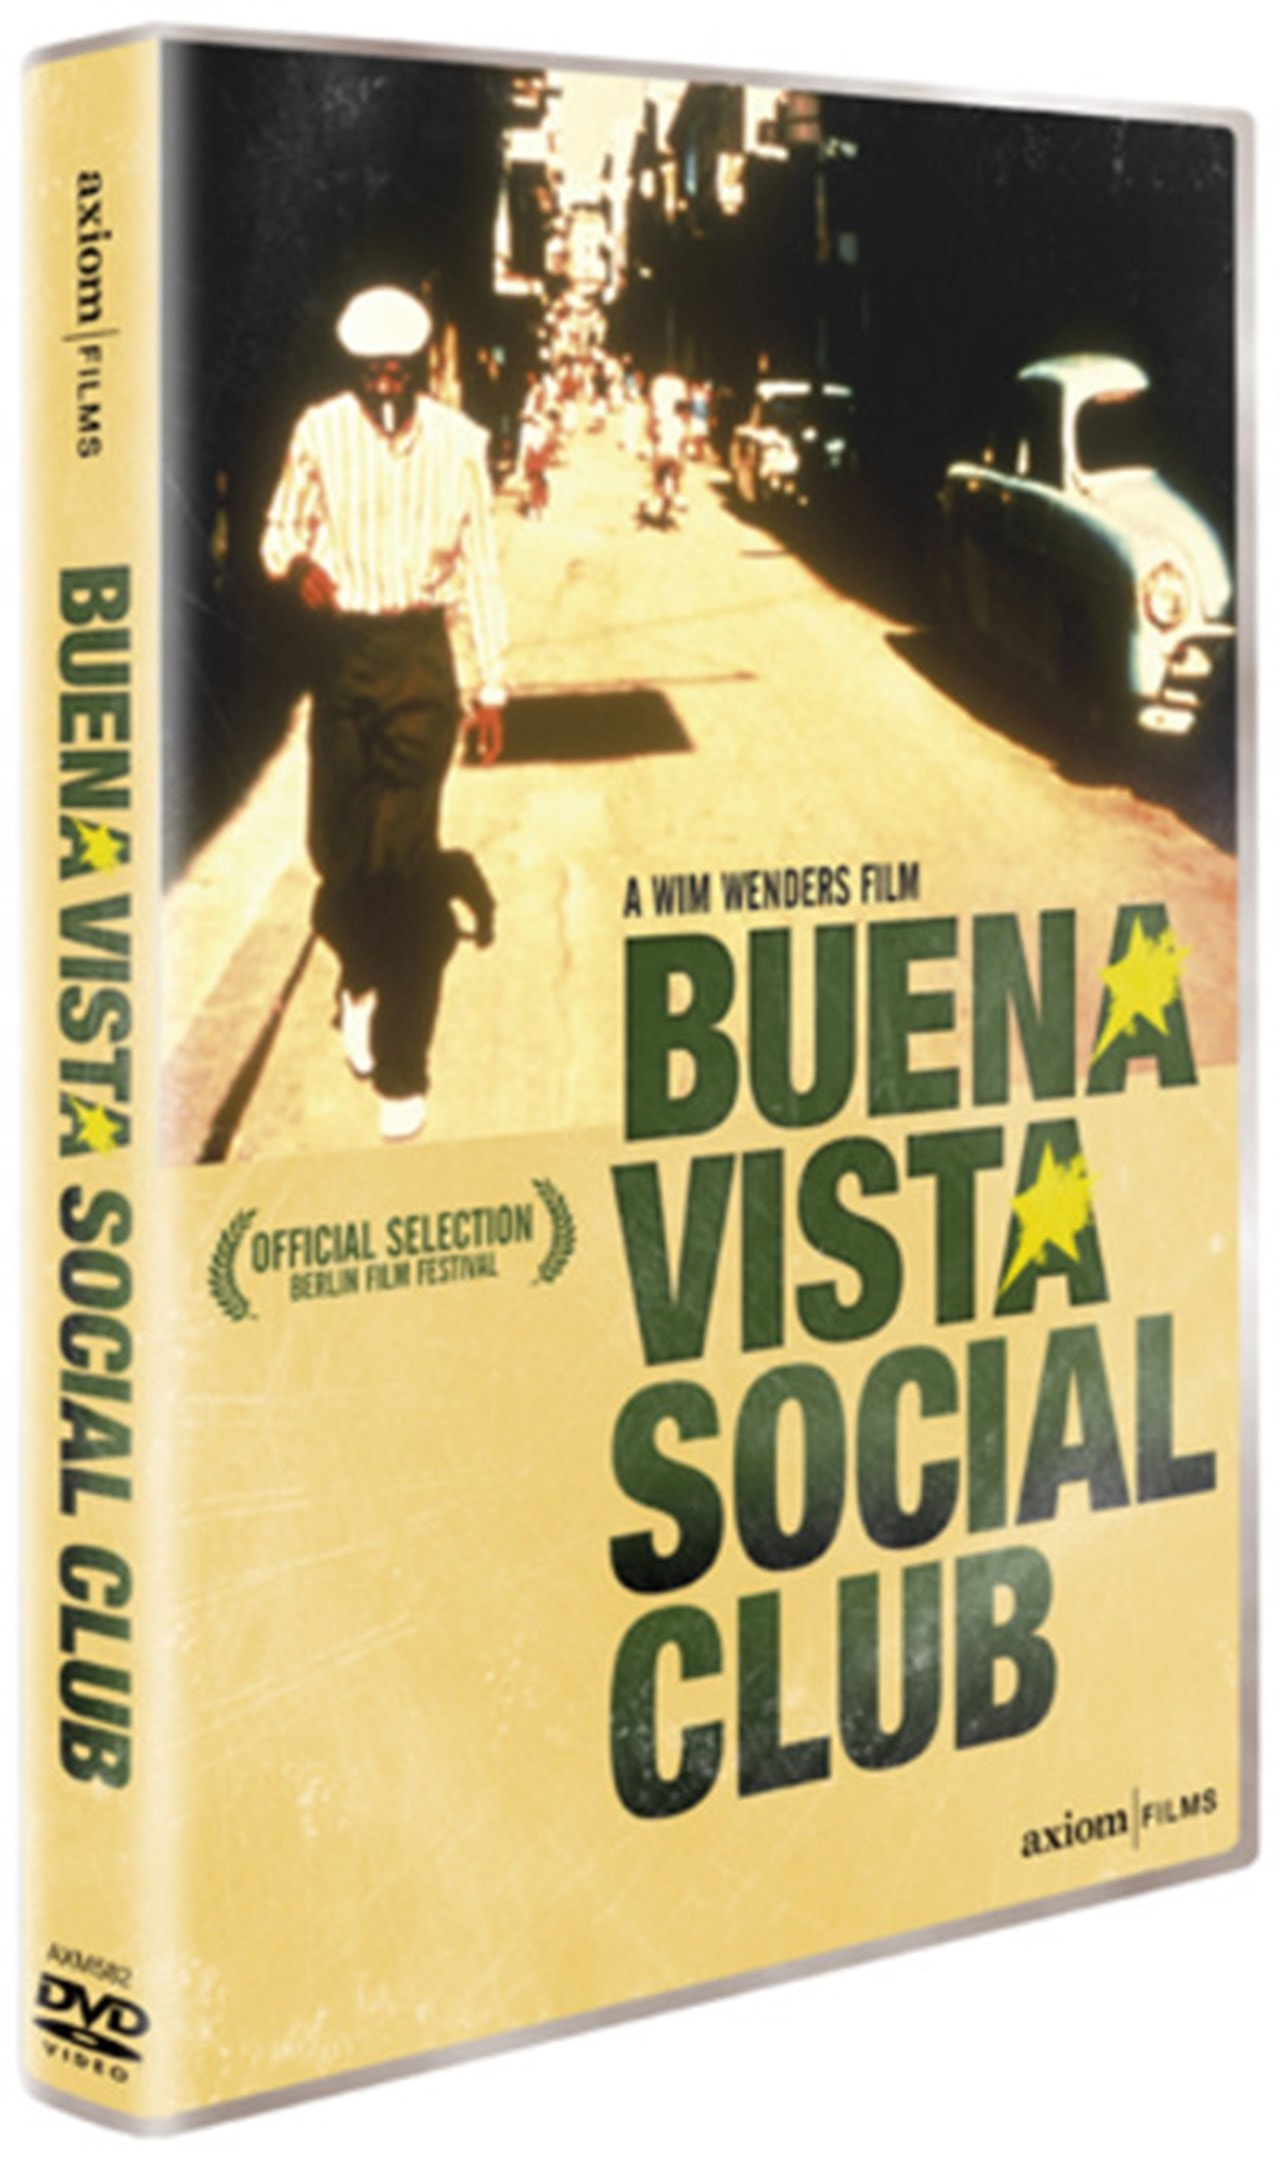 Buena Vista Social Club Dvd Free Shipping Over 20 Hmv Store